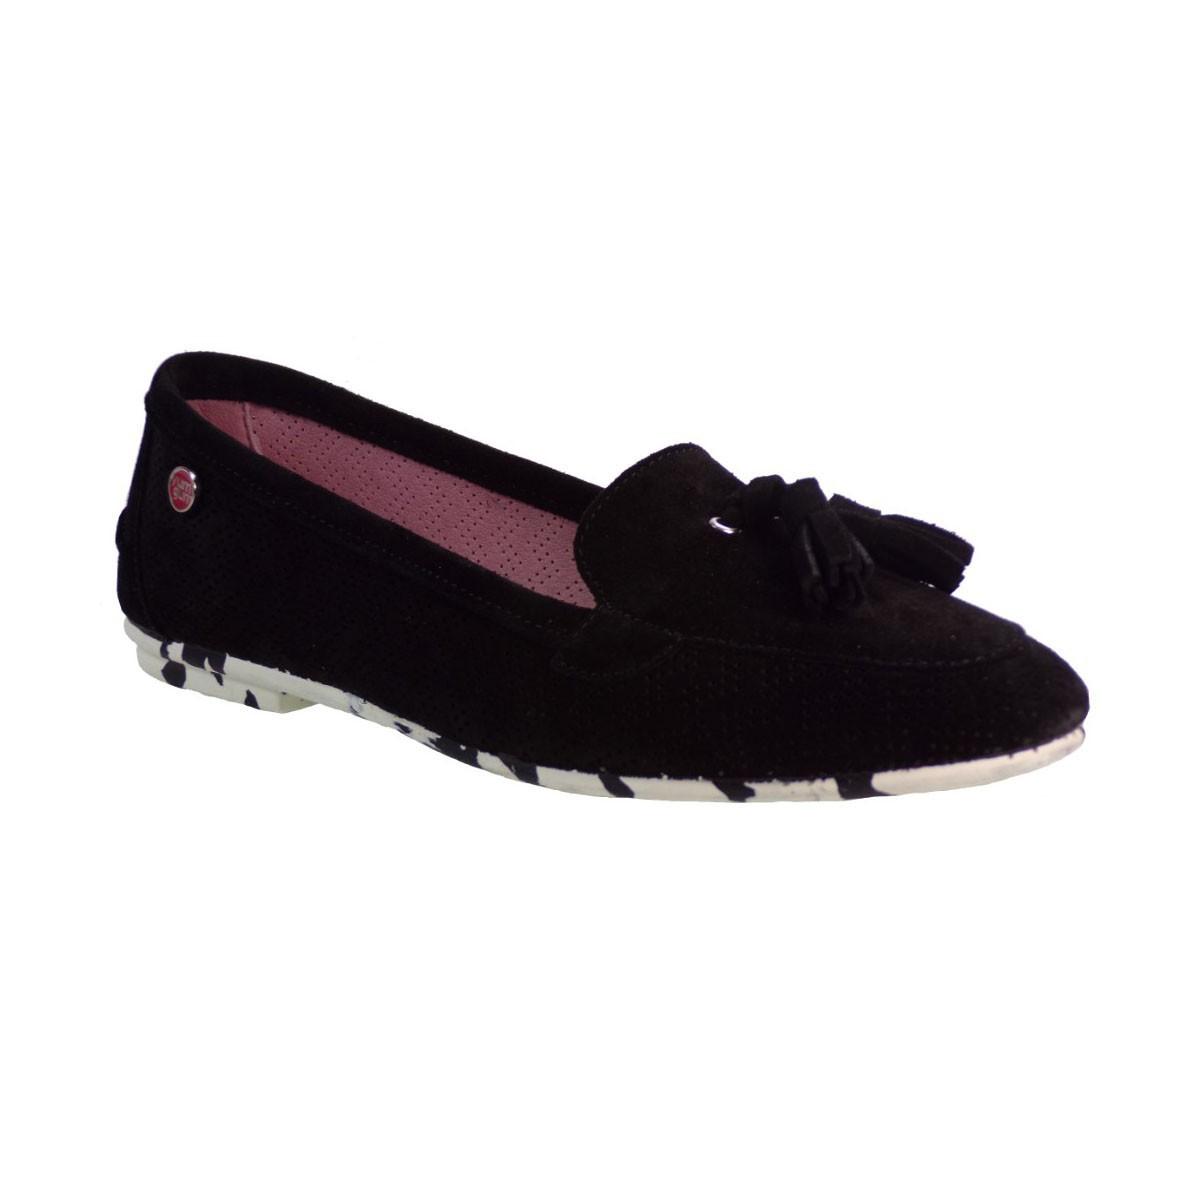 yum gum Γυναικεία Παπούτσια Mocassin Mina 17SW604/01 Μαύρο yum gum Mocassin Mina 17SW604/01 Μ